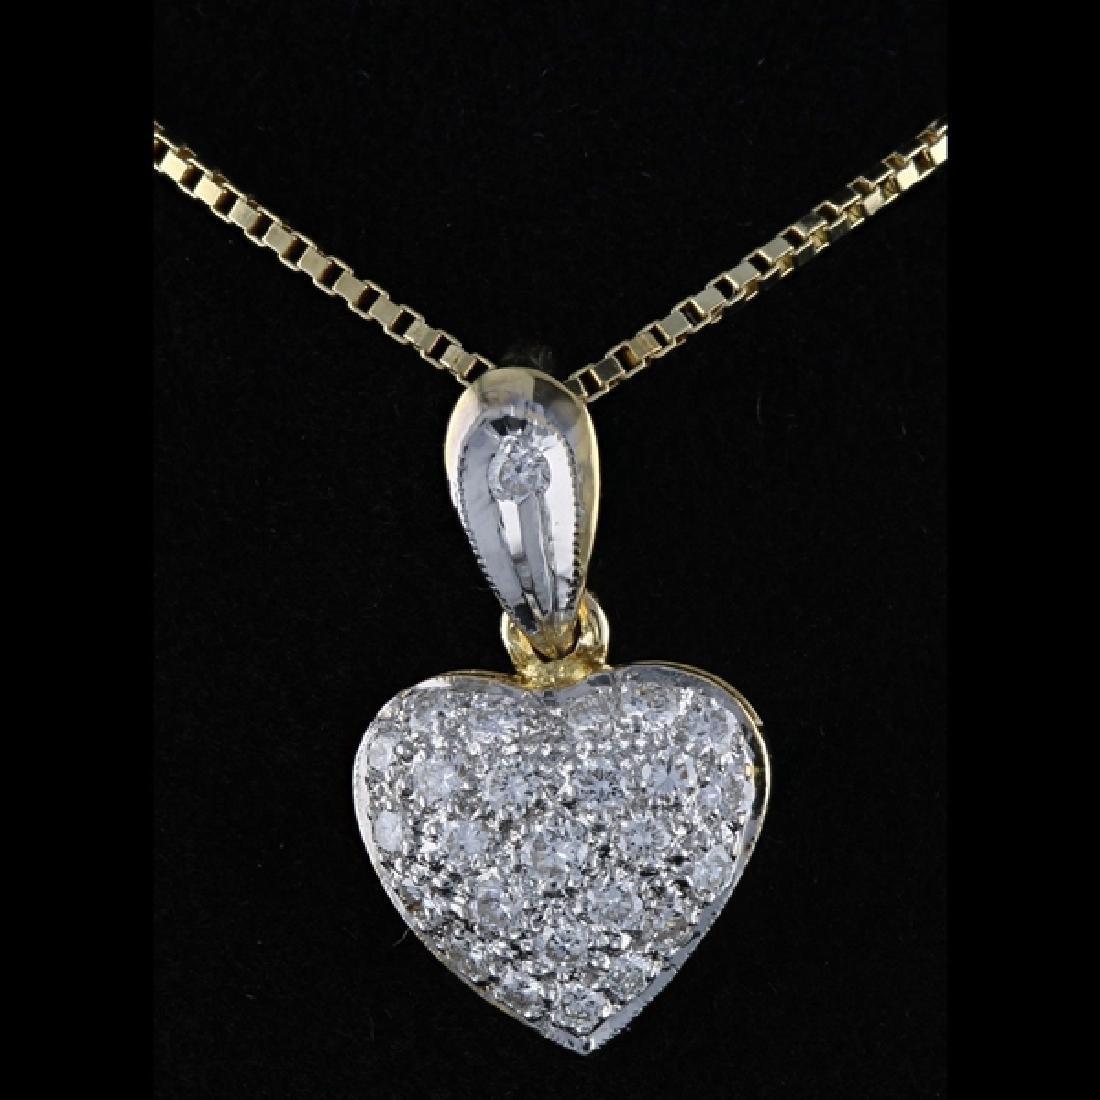 14k Y Gold 0.51CTW Diamond Heart Pendant Necklace